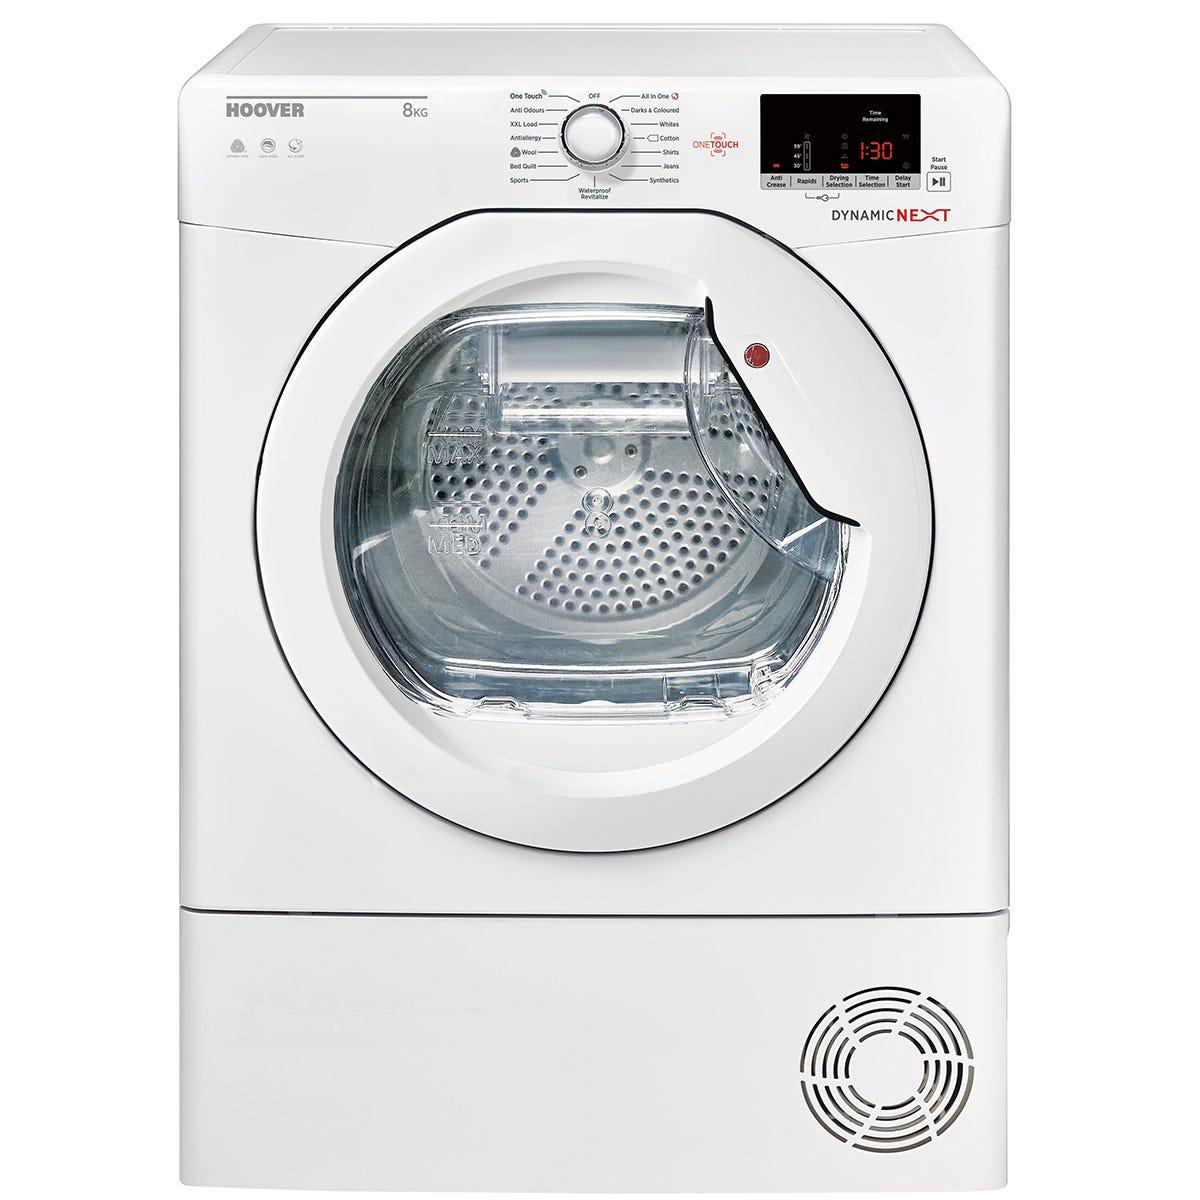 Hoover DXC8DE 8kg Aquavision Condenser Tumble Dryer - White